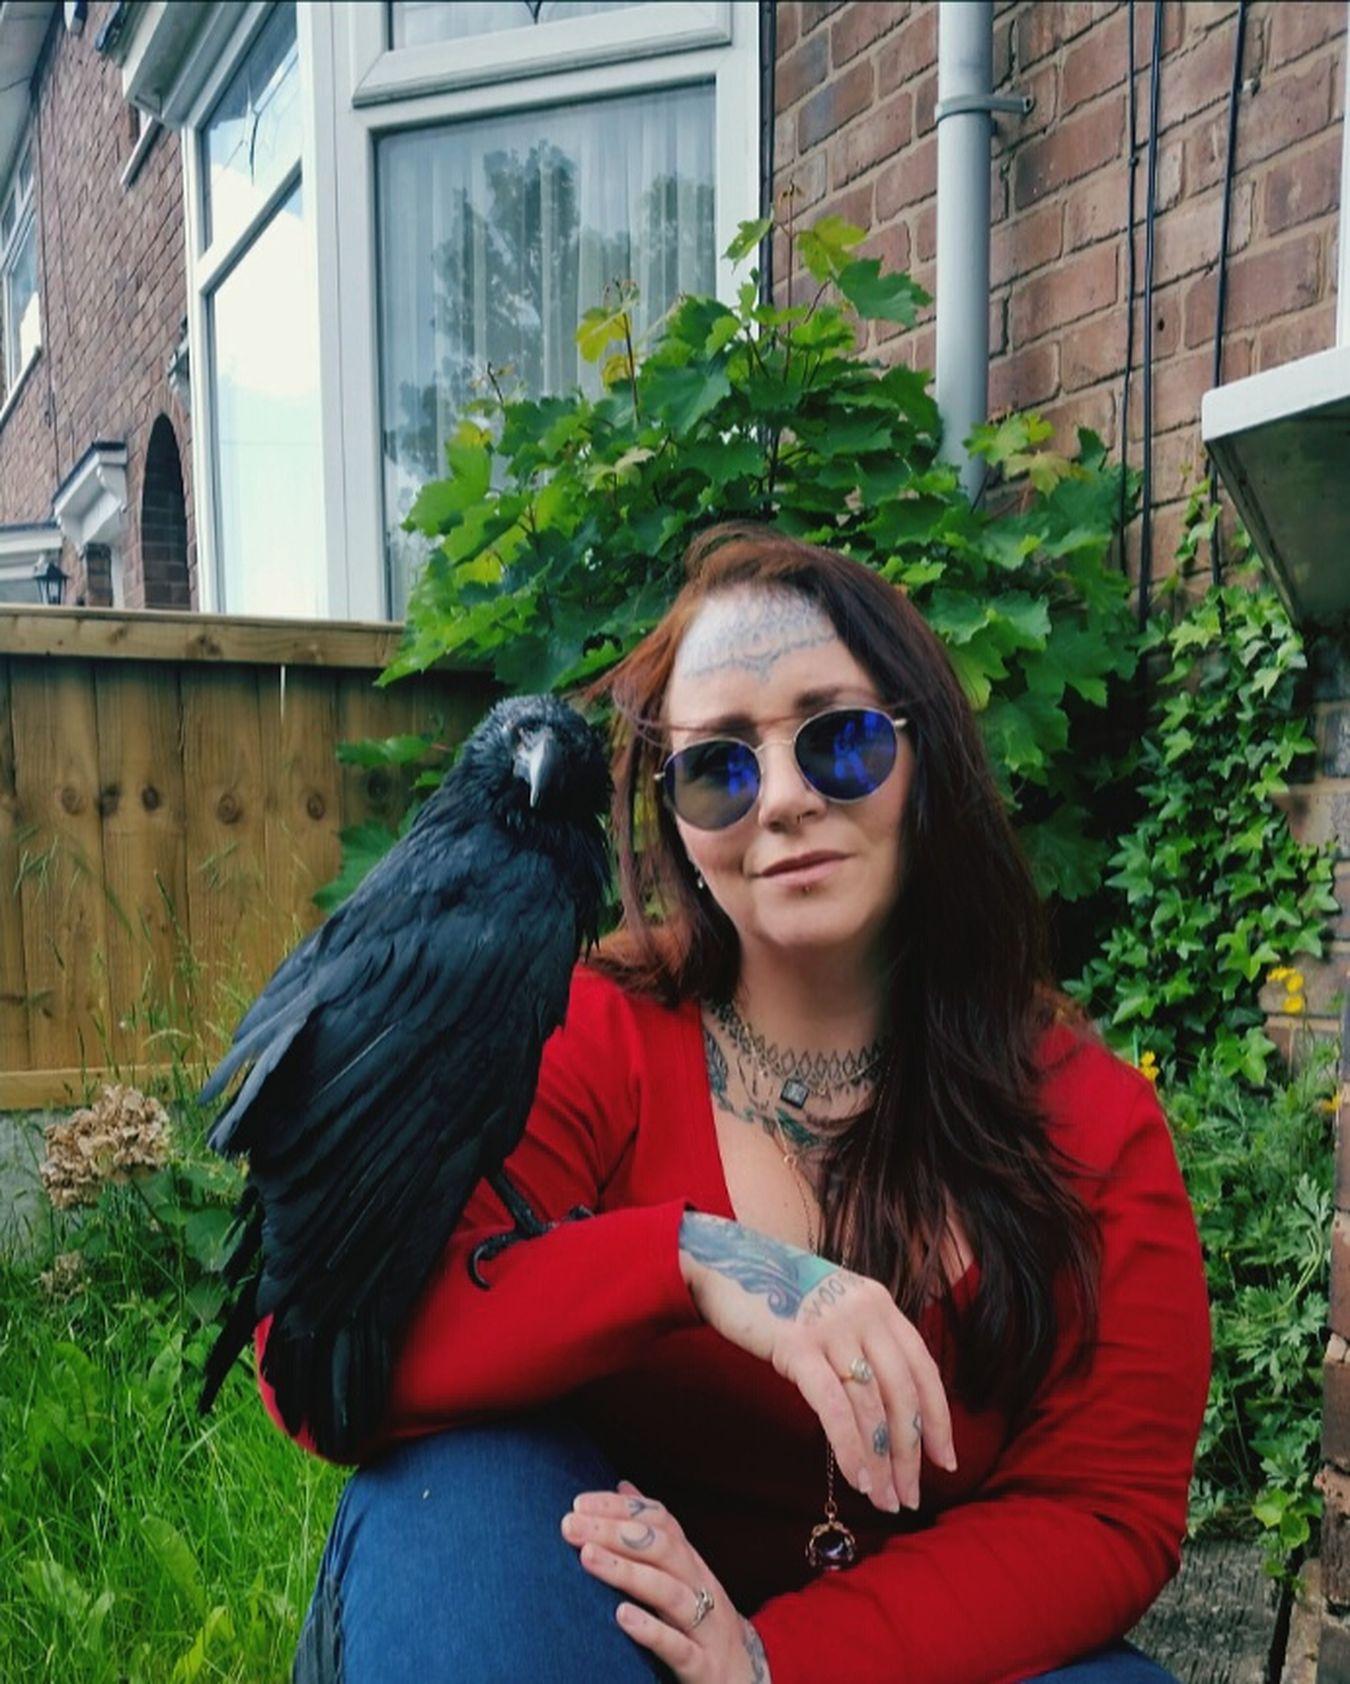 Me and rescue crow Archie :) Crow Rescue Rescuecrow Love Pet MyBoy Garden Selfie Petcrow Corvid